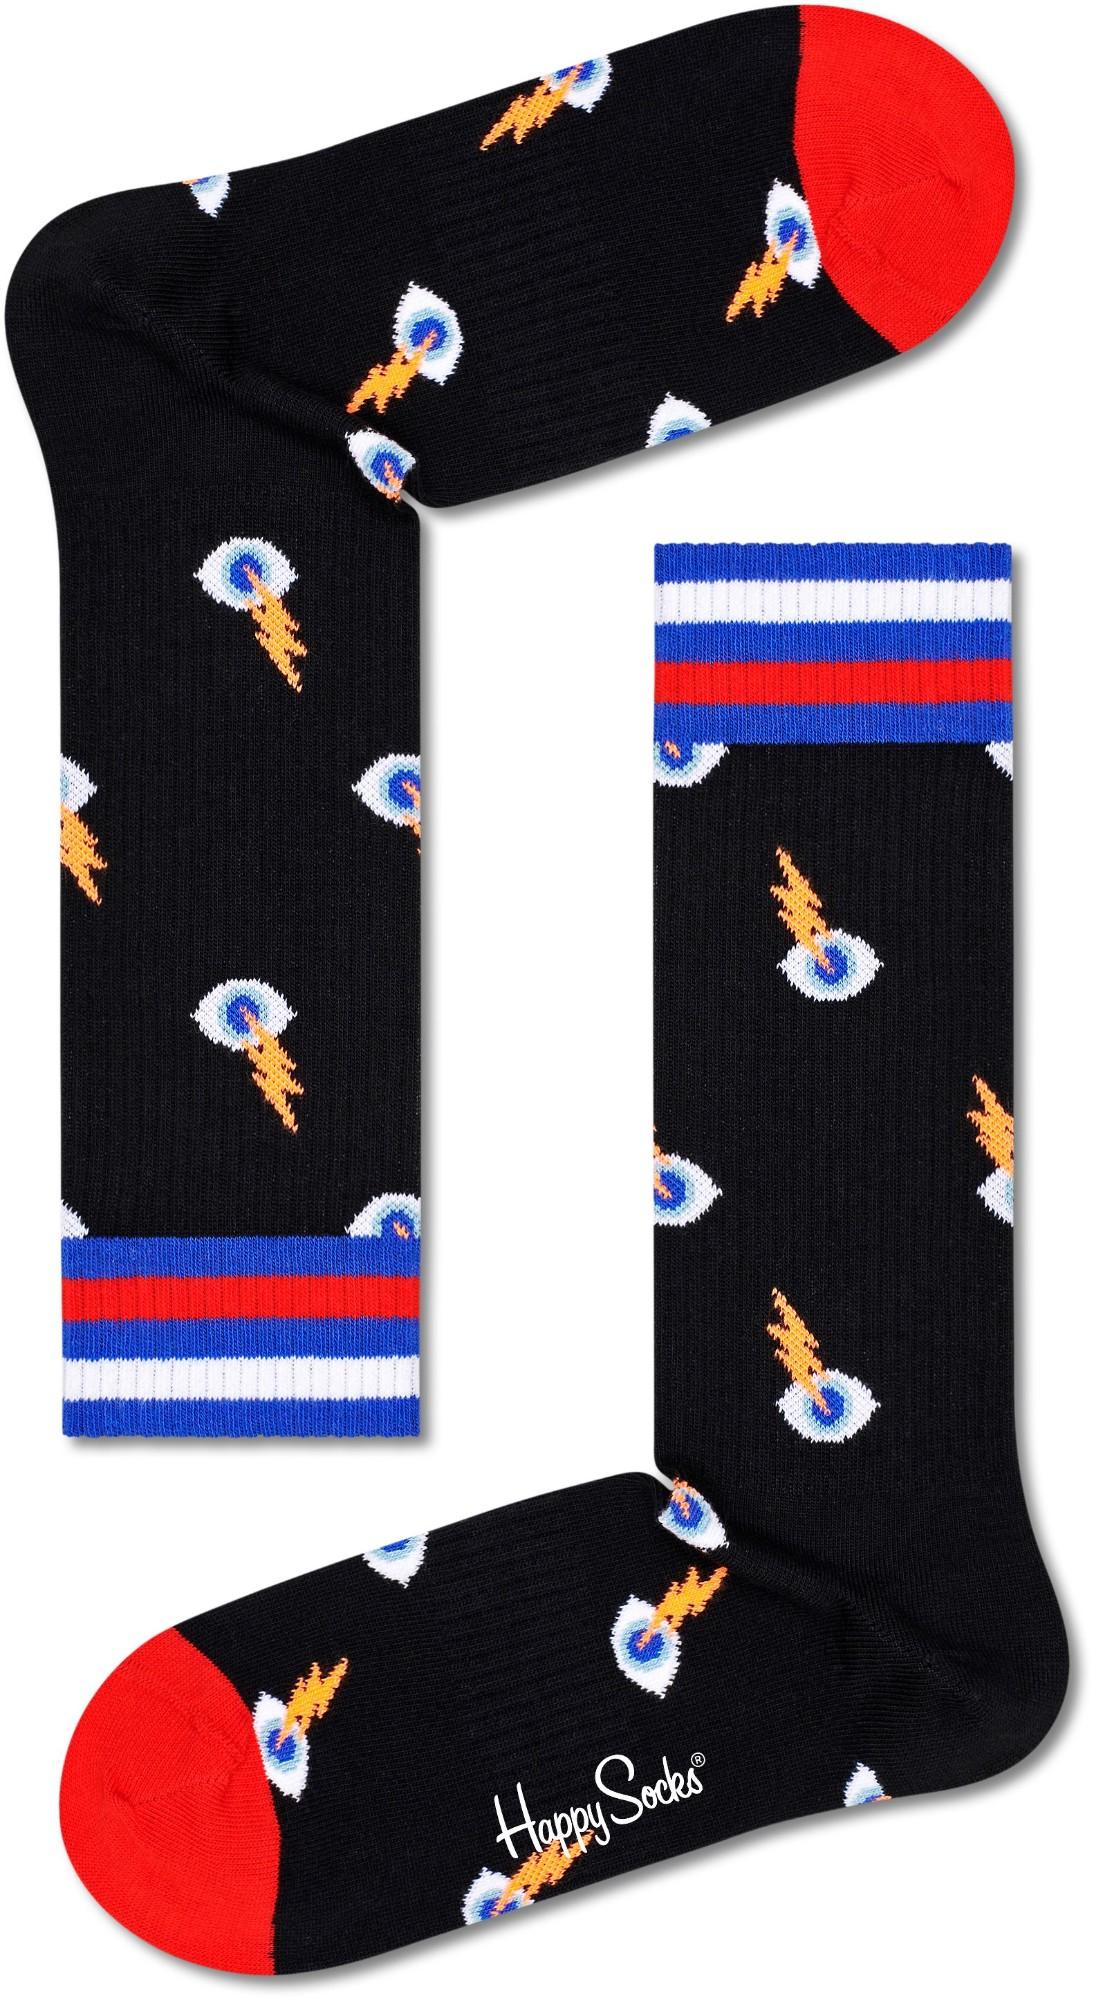 Happy Socks I See You Thin Crew Multi 9300 41-46